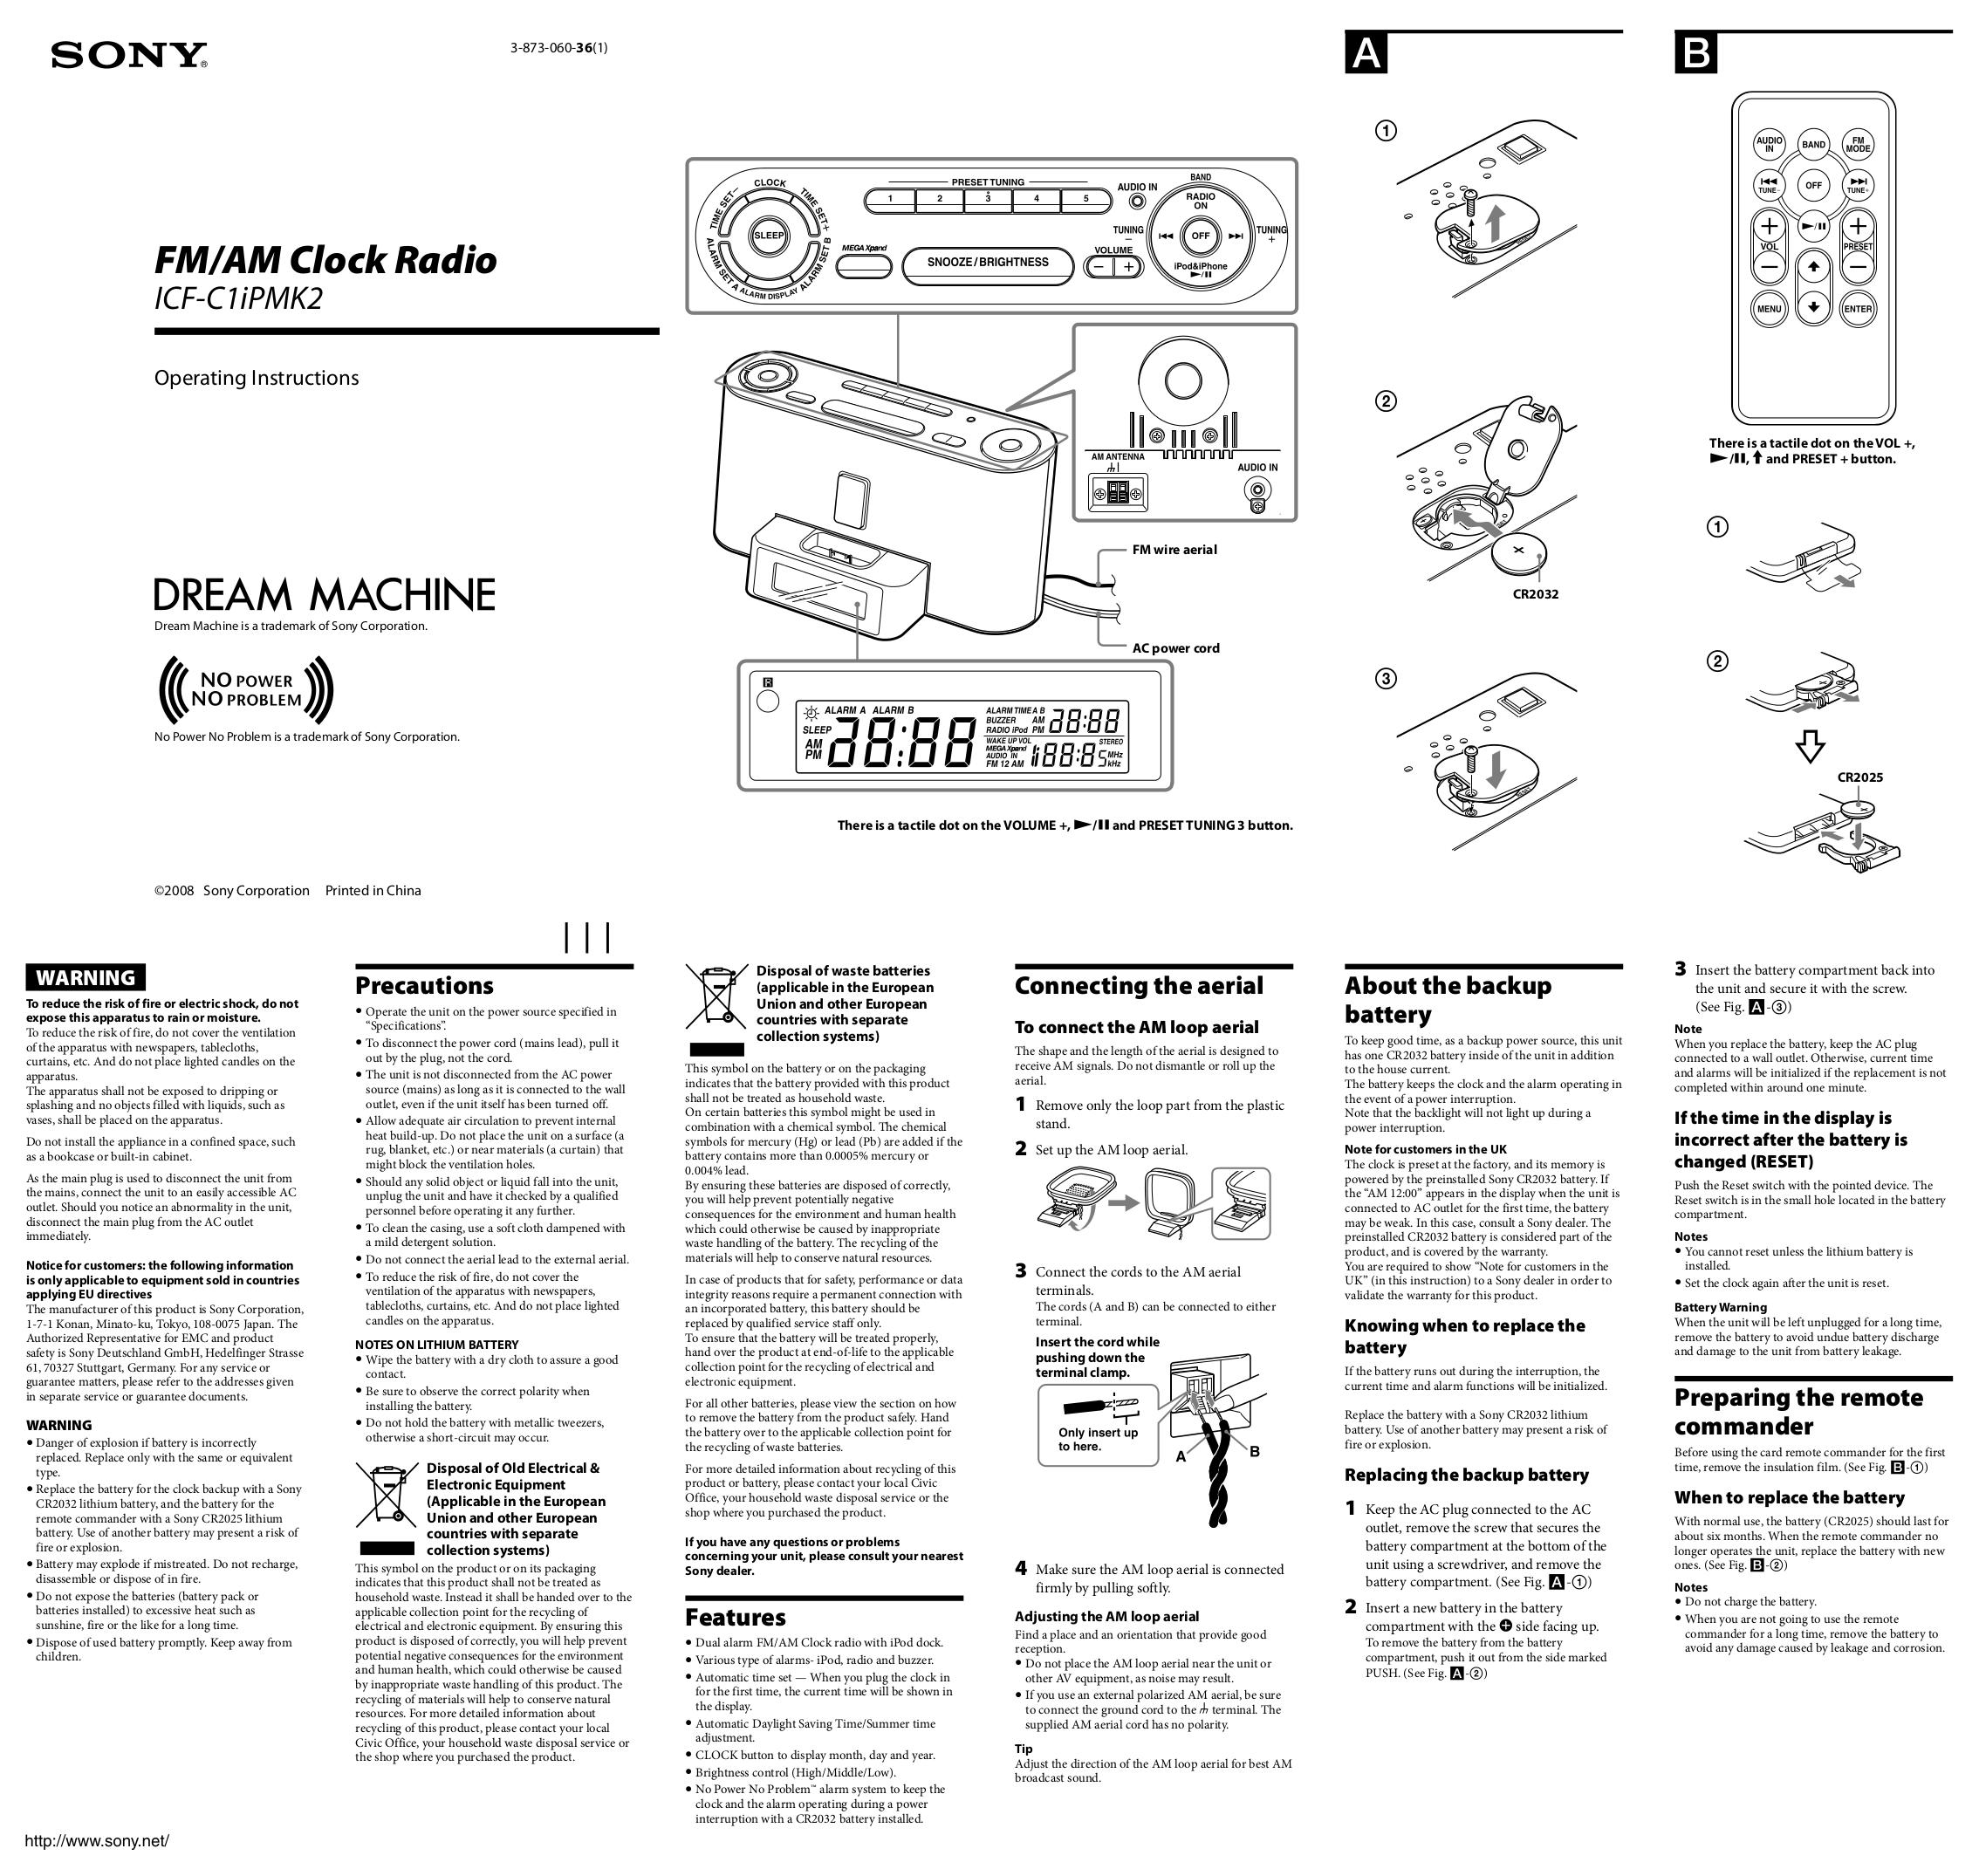 download free pdf for sony icf c1ipmk2 clock radio manual rh umlib com Sony Dream Machine Clock Radio Sony Dream Machine Directions